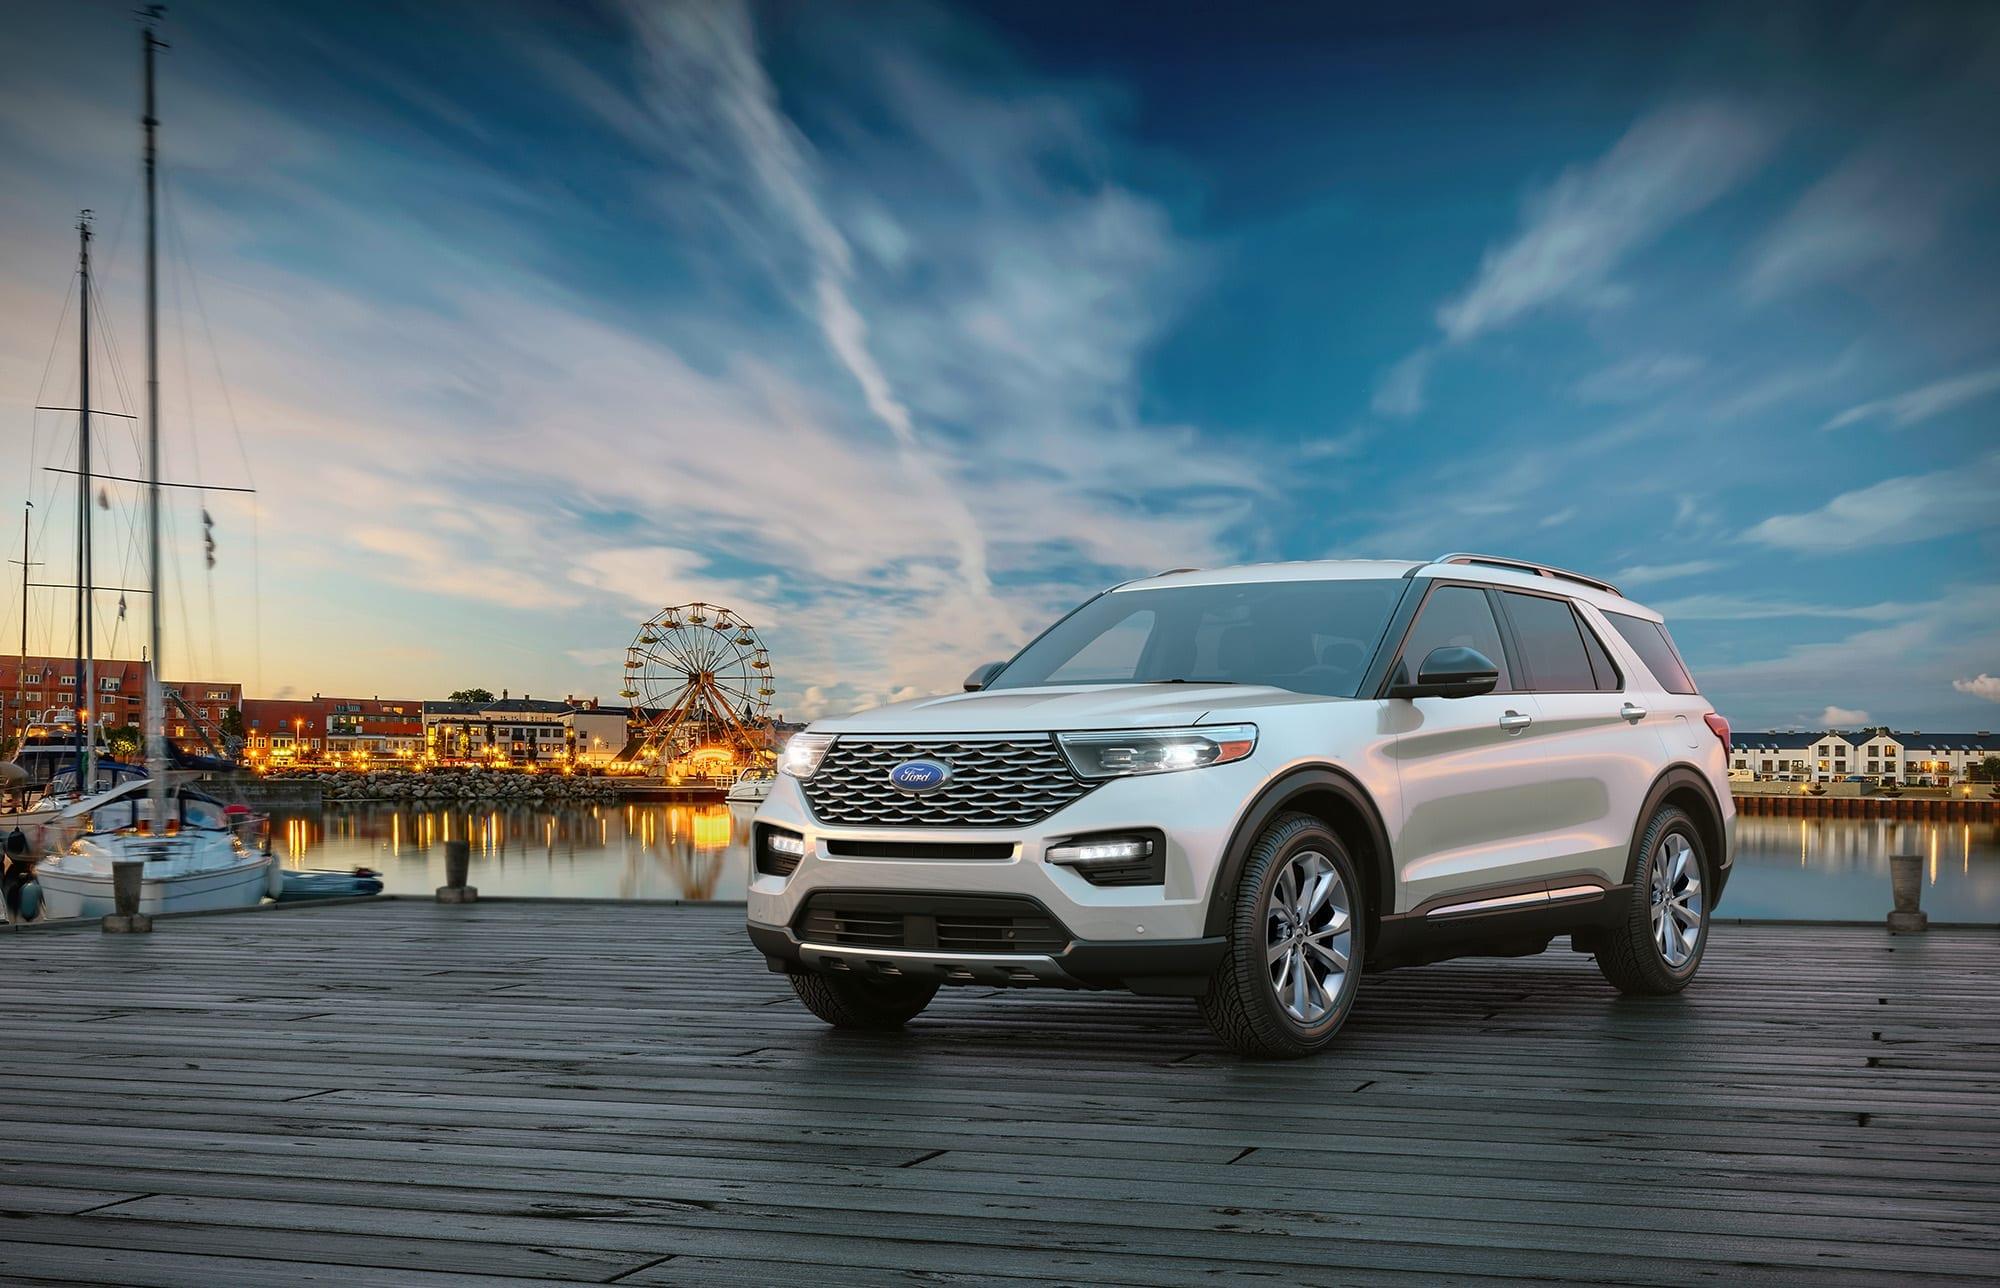 2021 Ford Explorer white front profile outdoor scene